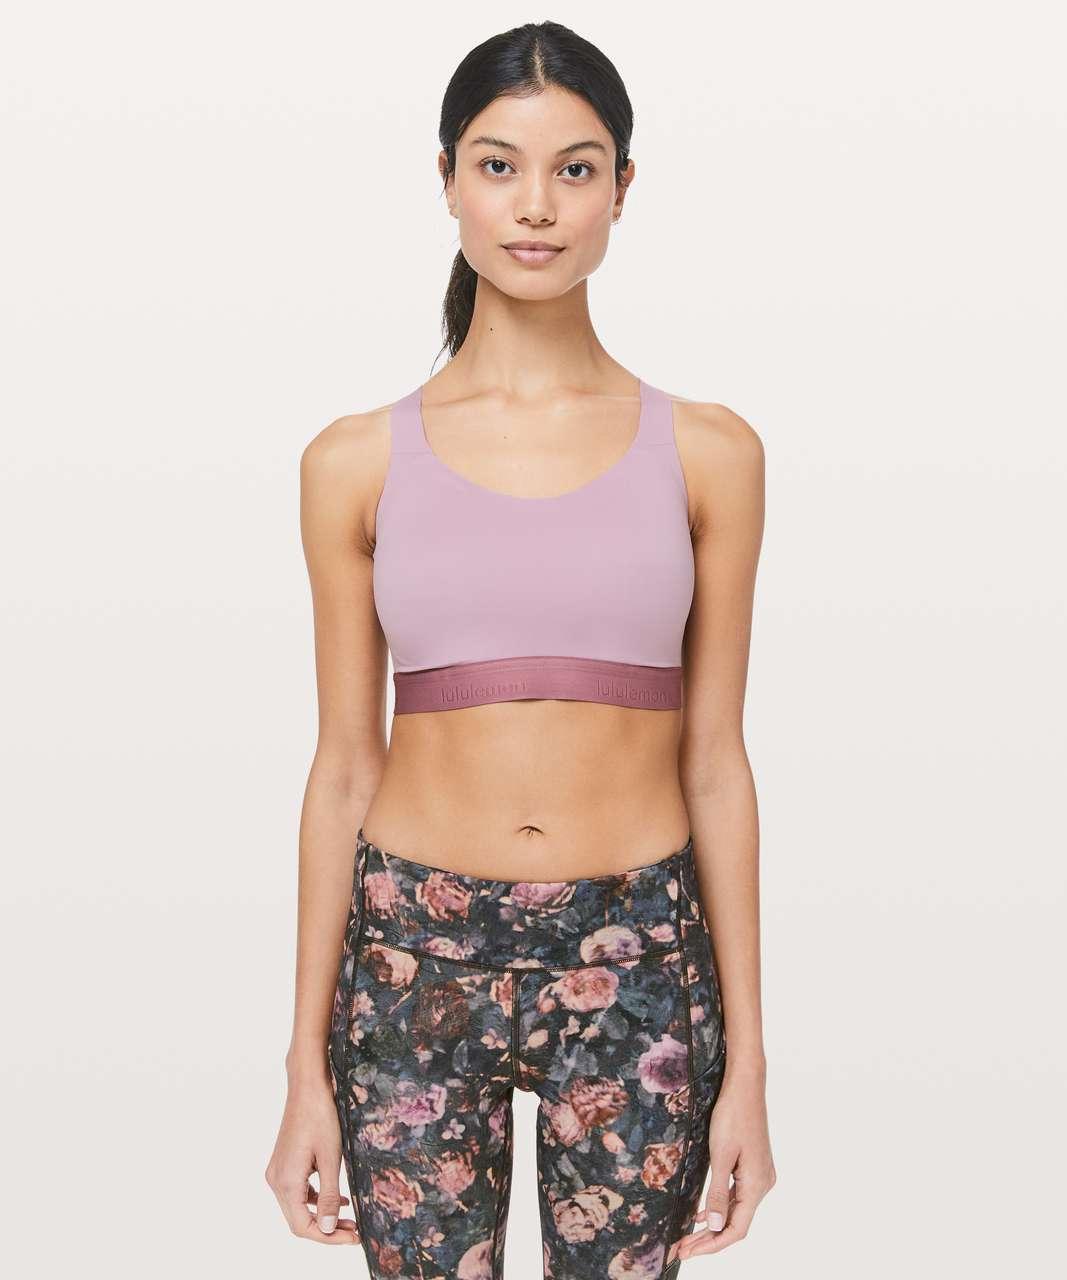 Lululemon Fine Form Bra - Rose Blush